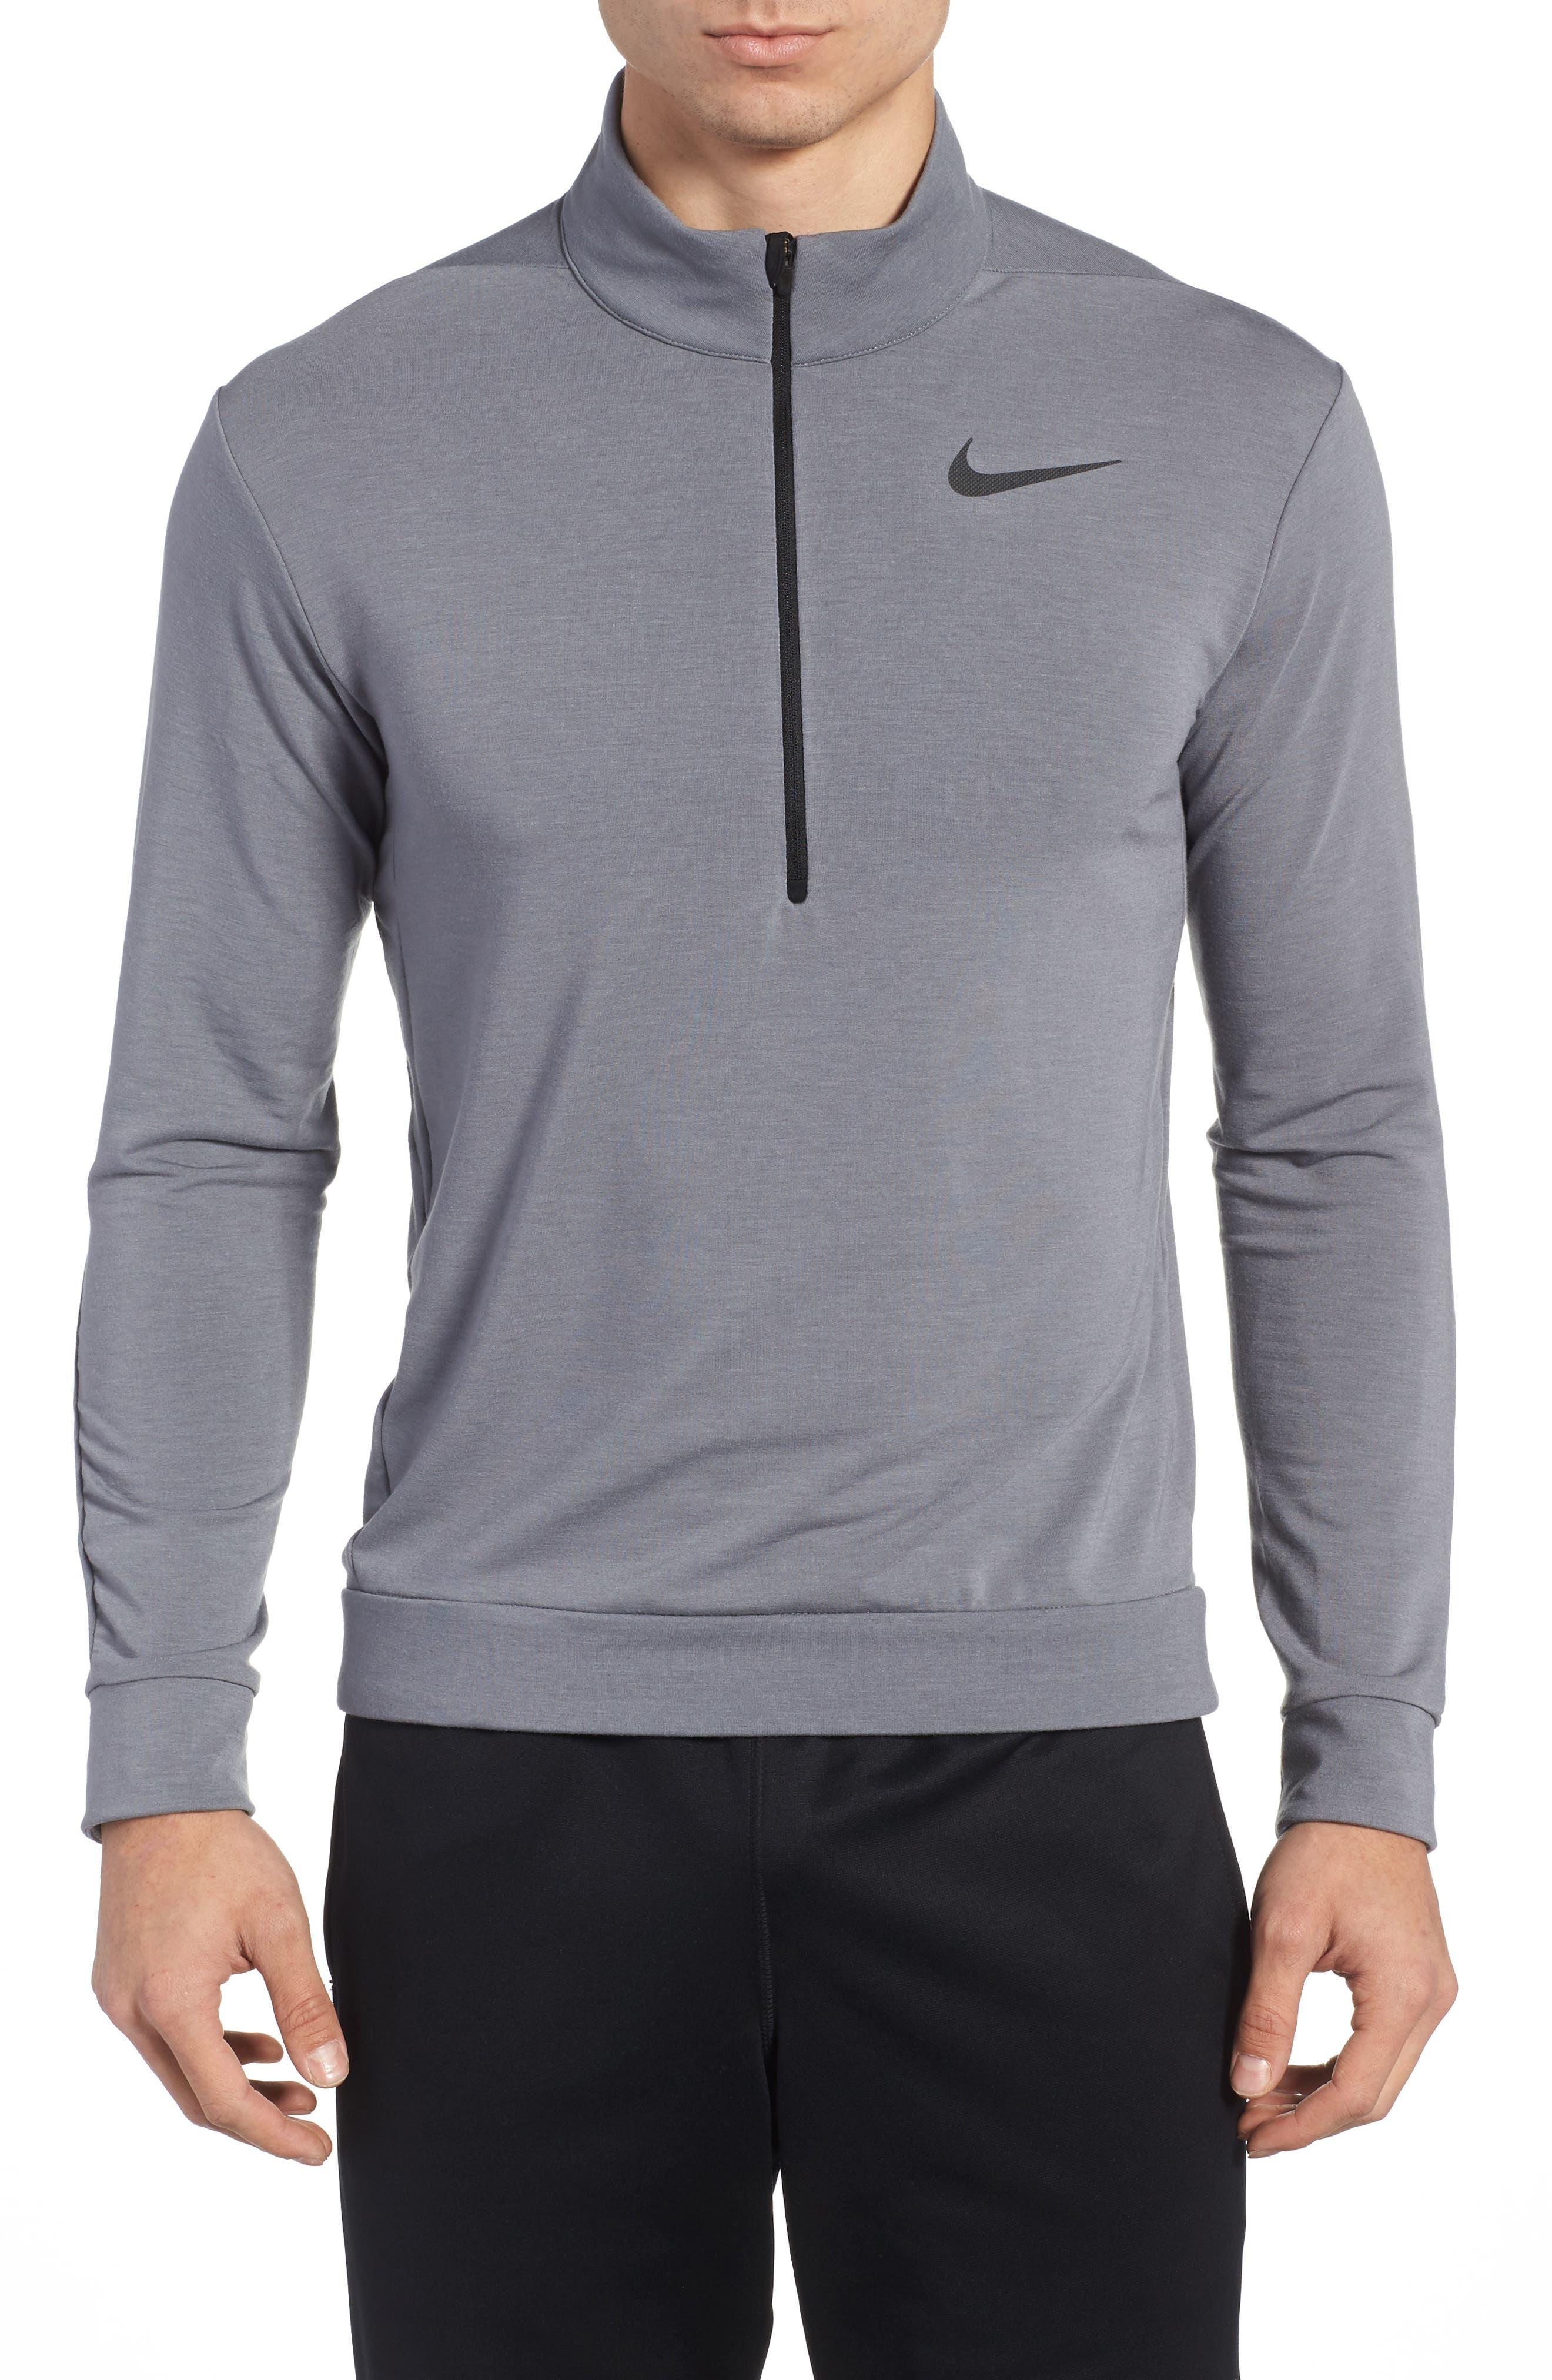 Main Image - Nike Dry Training Quarter Zip Pullover